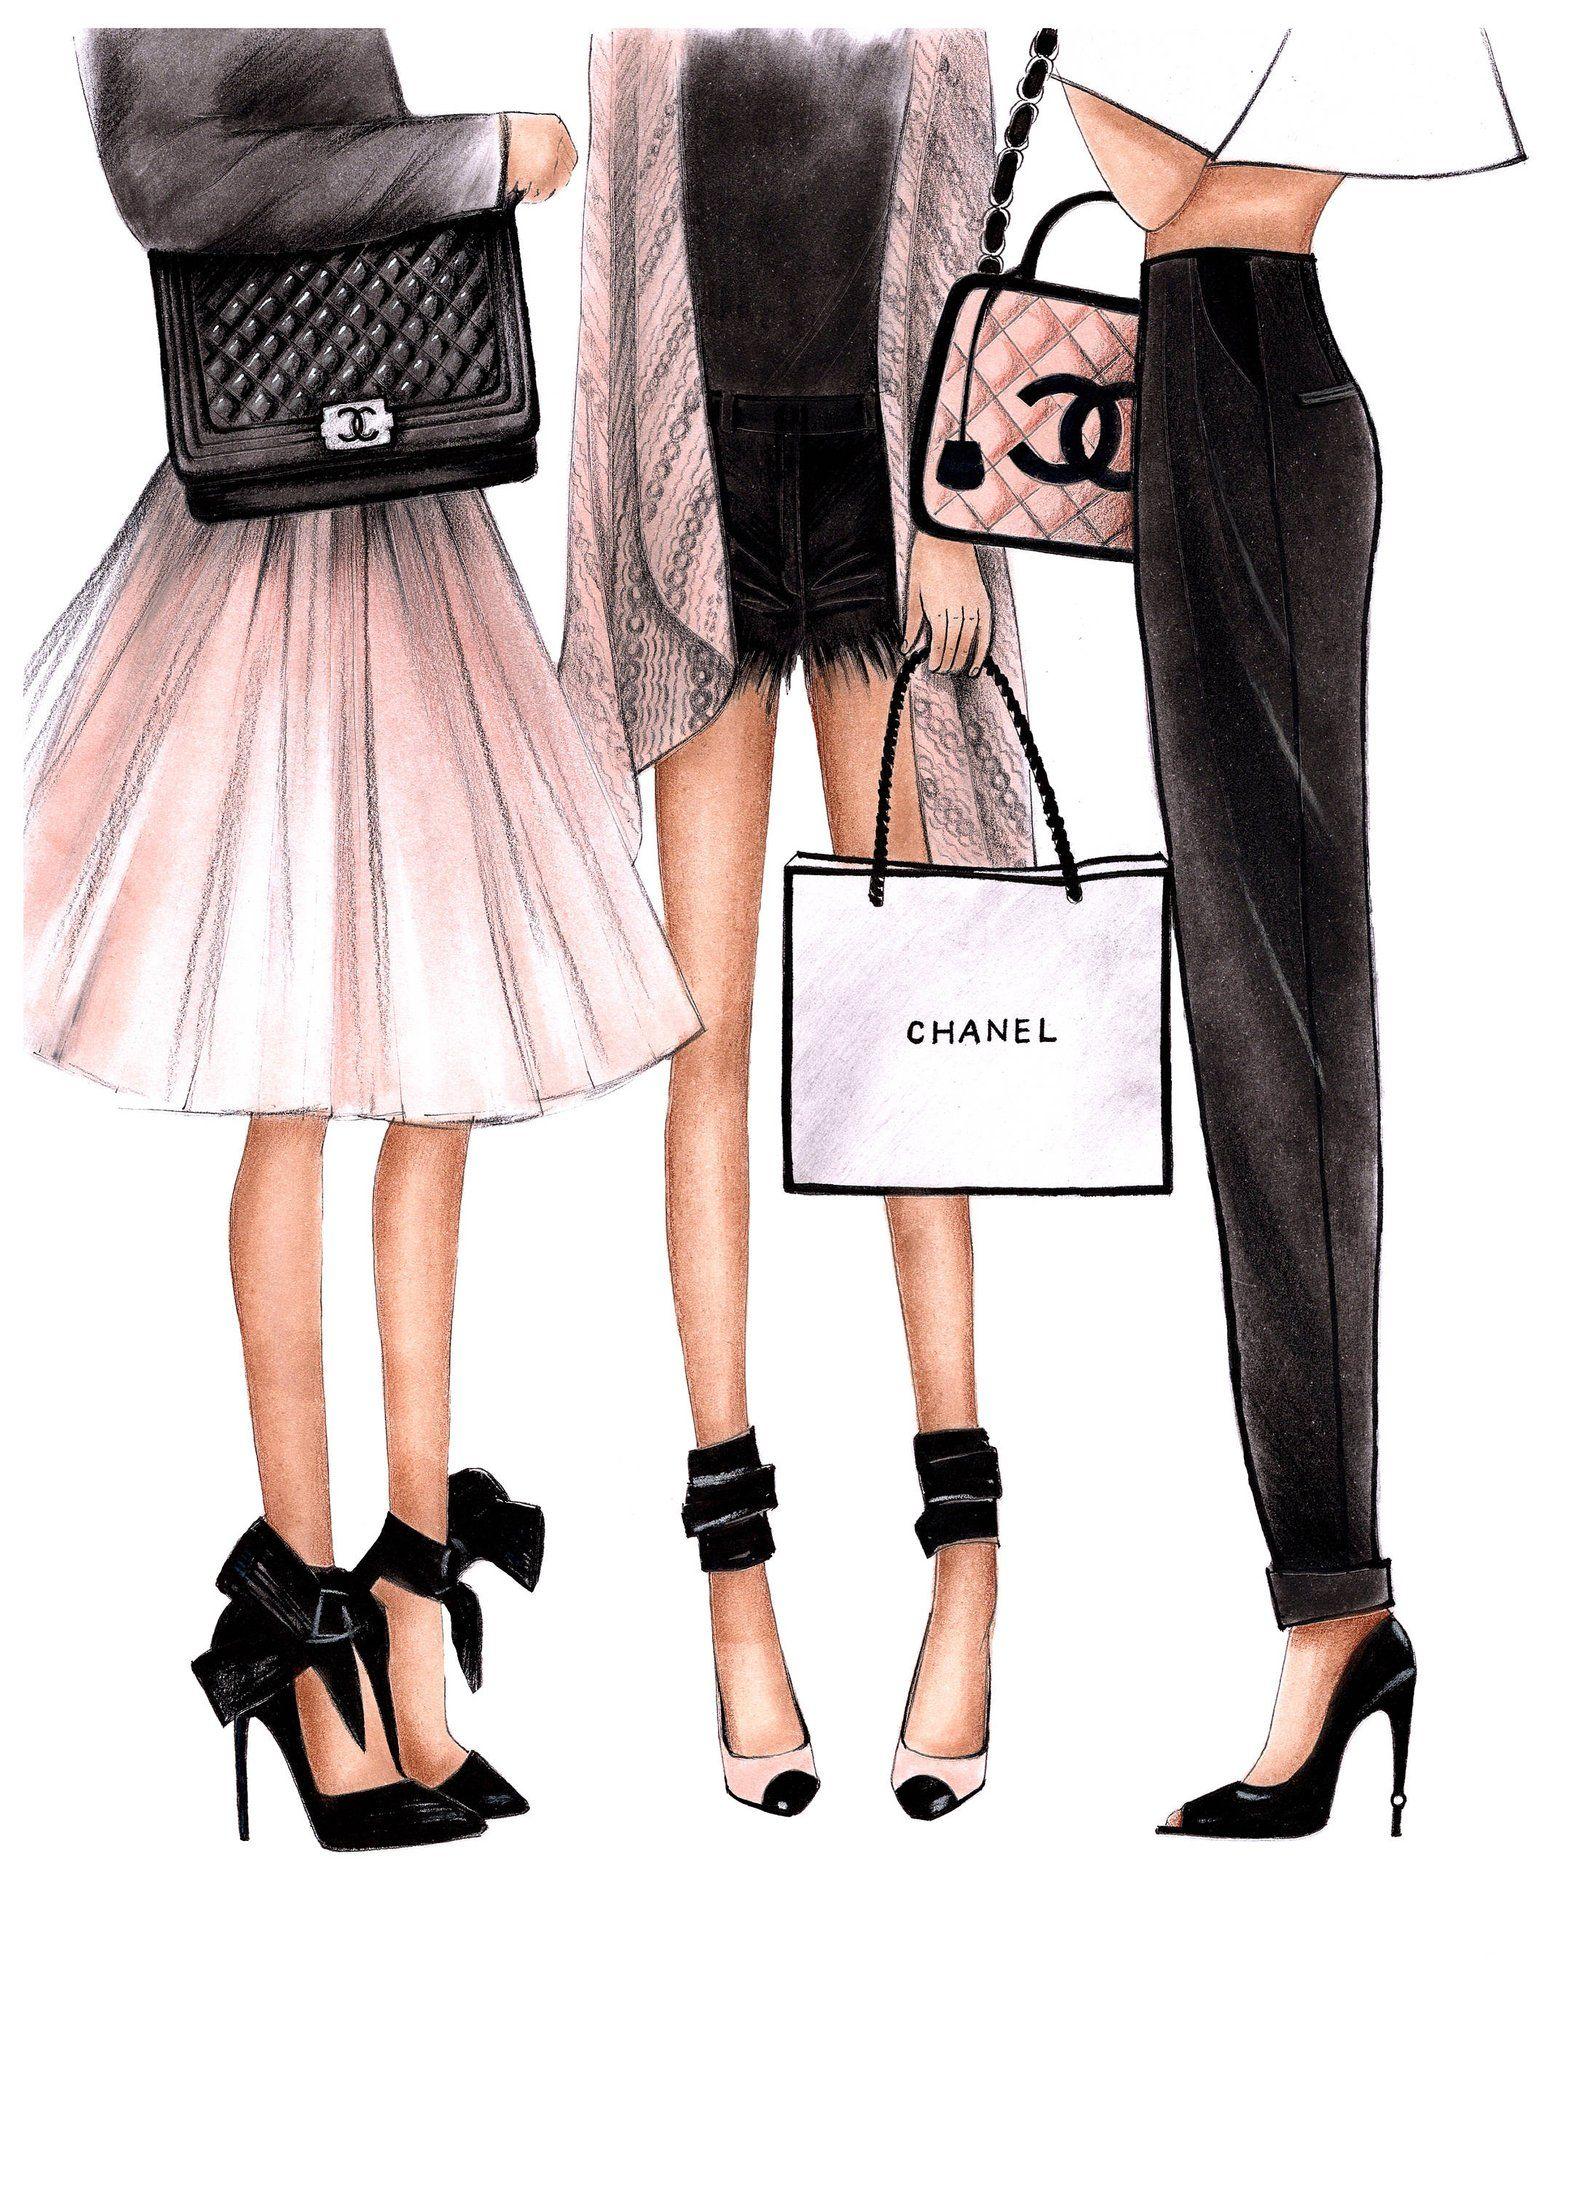 Fashion Illustration Chanel Art Chanel Print Fashion Wall Art Etsy Chanel Print Chanel Art Print Chanel Art